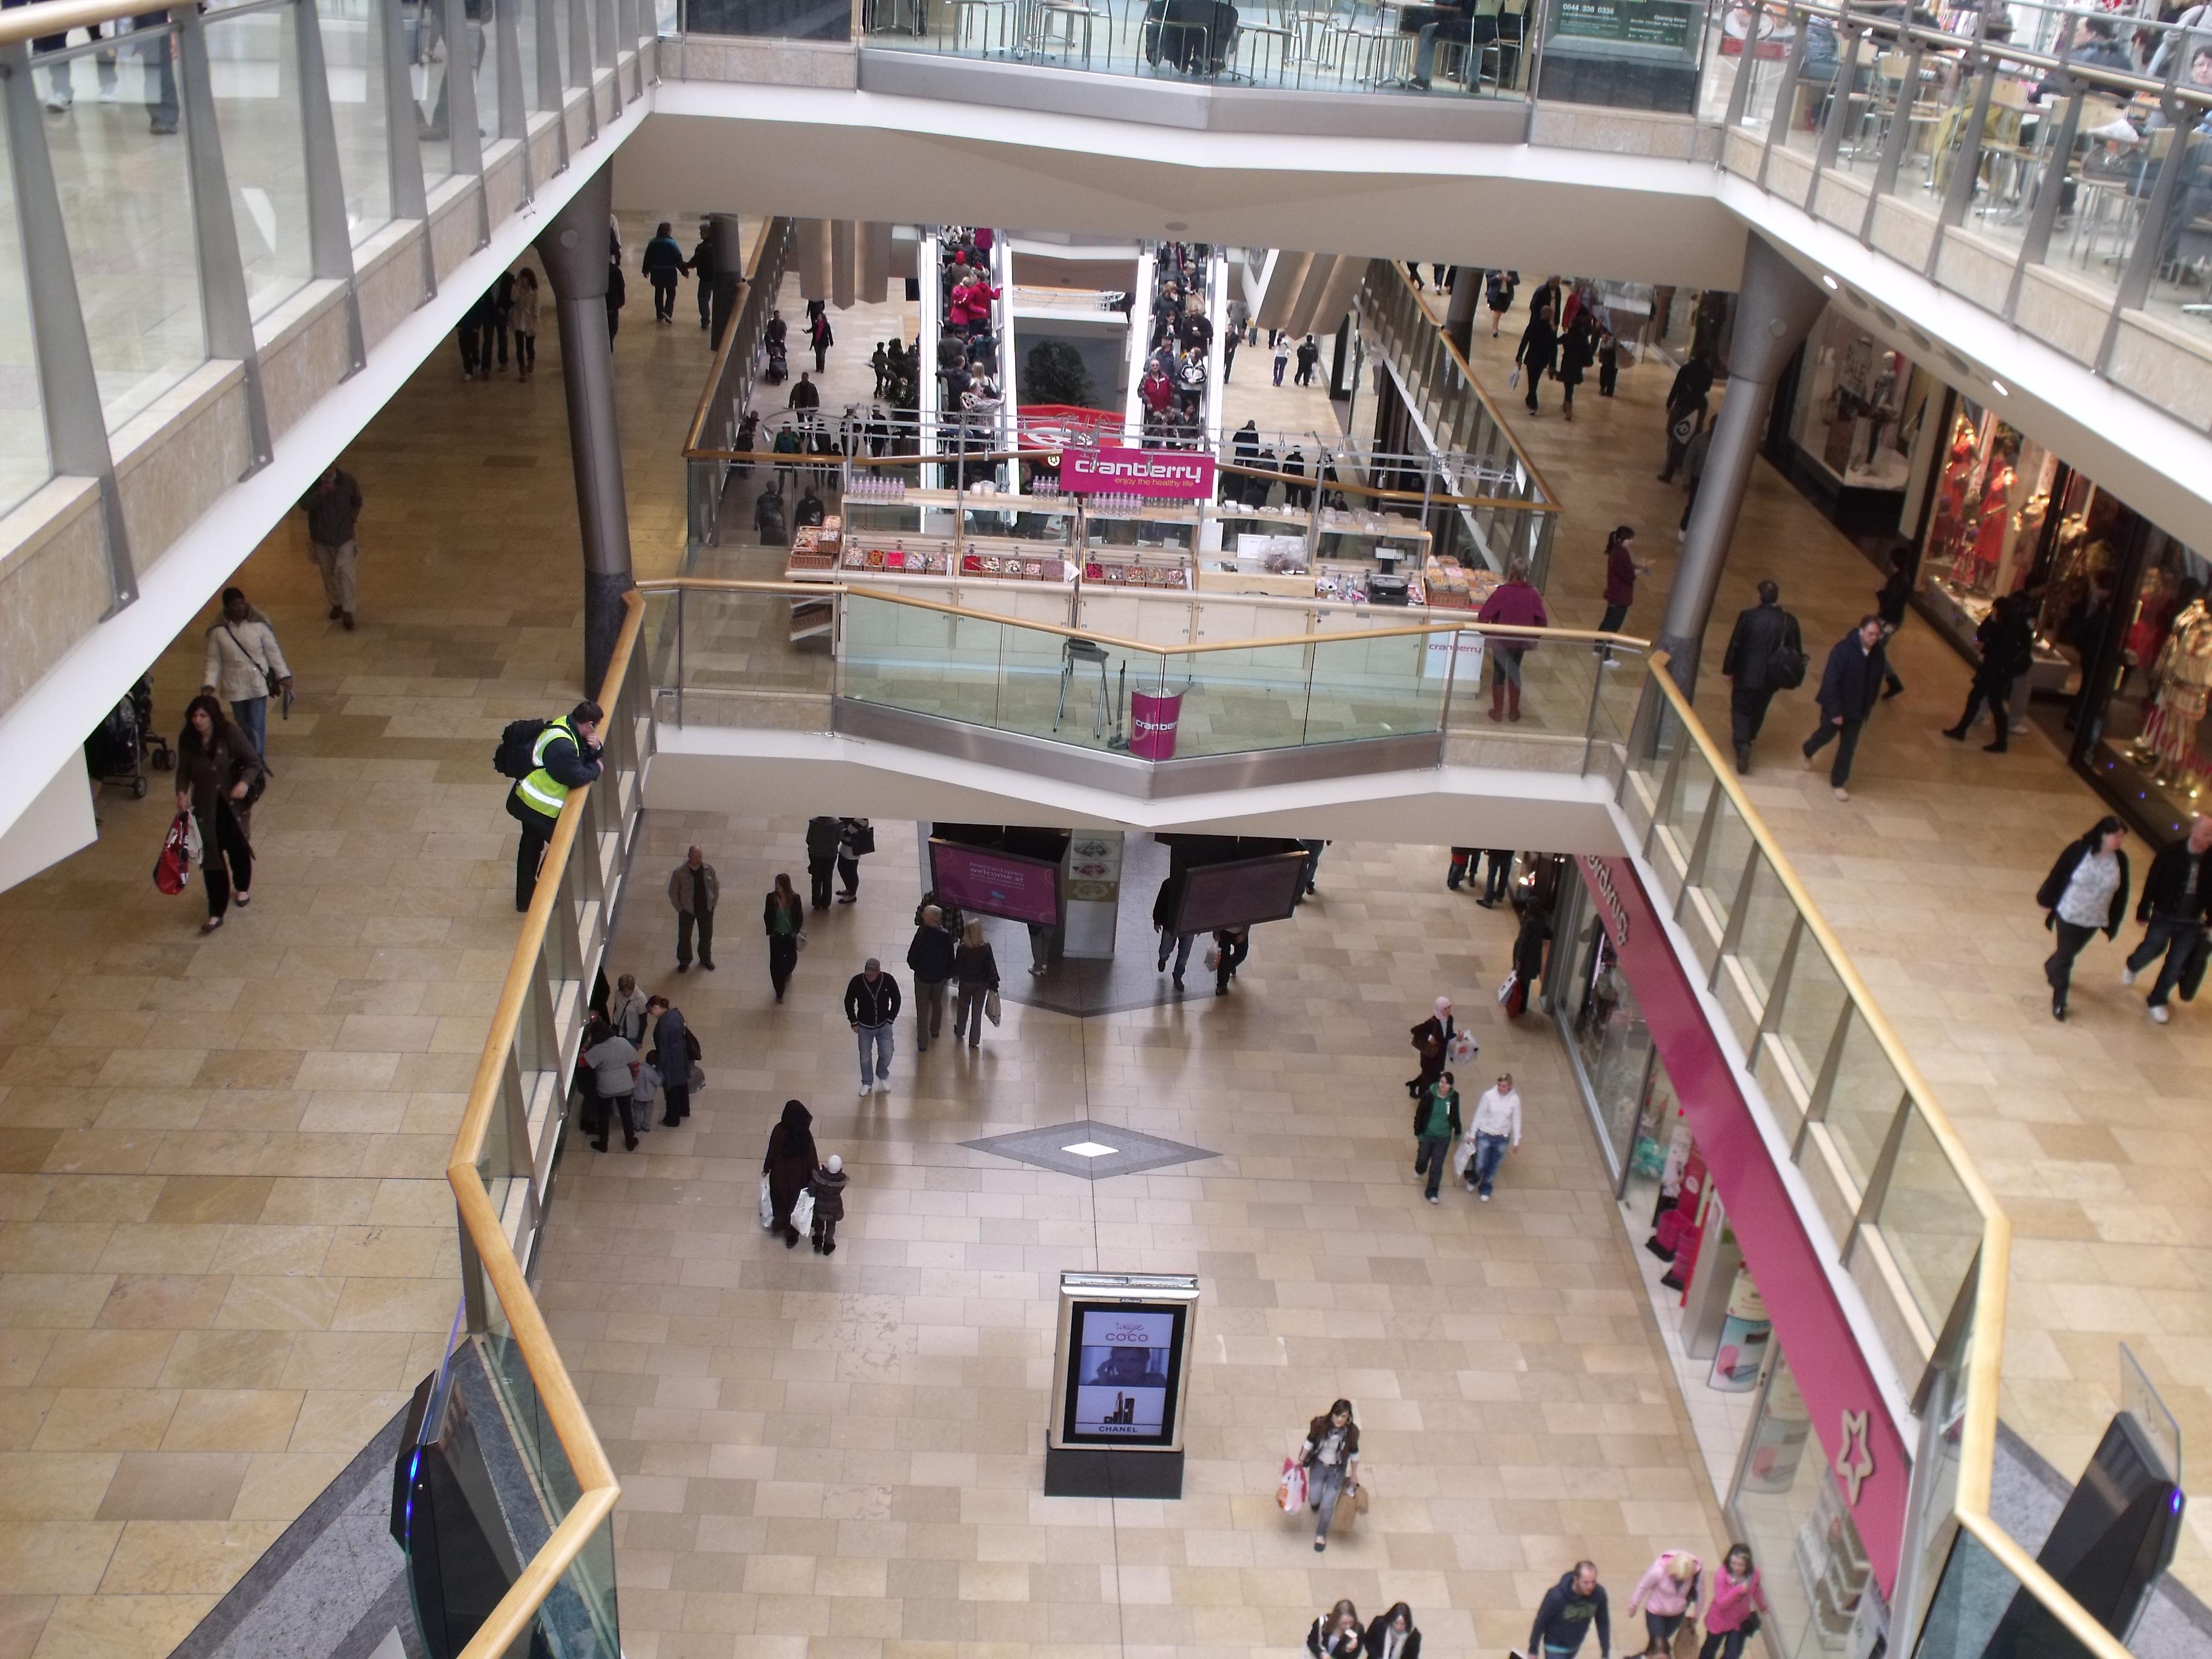 Curaishe Shopping Centre